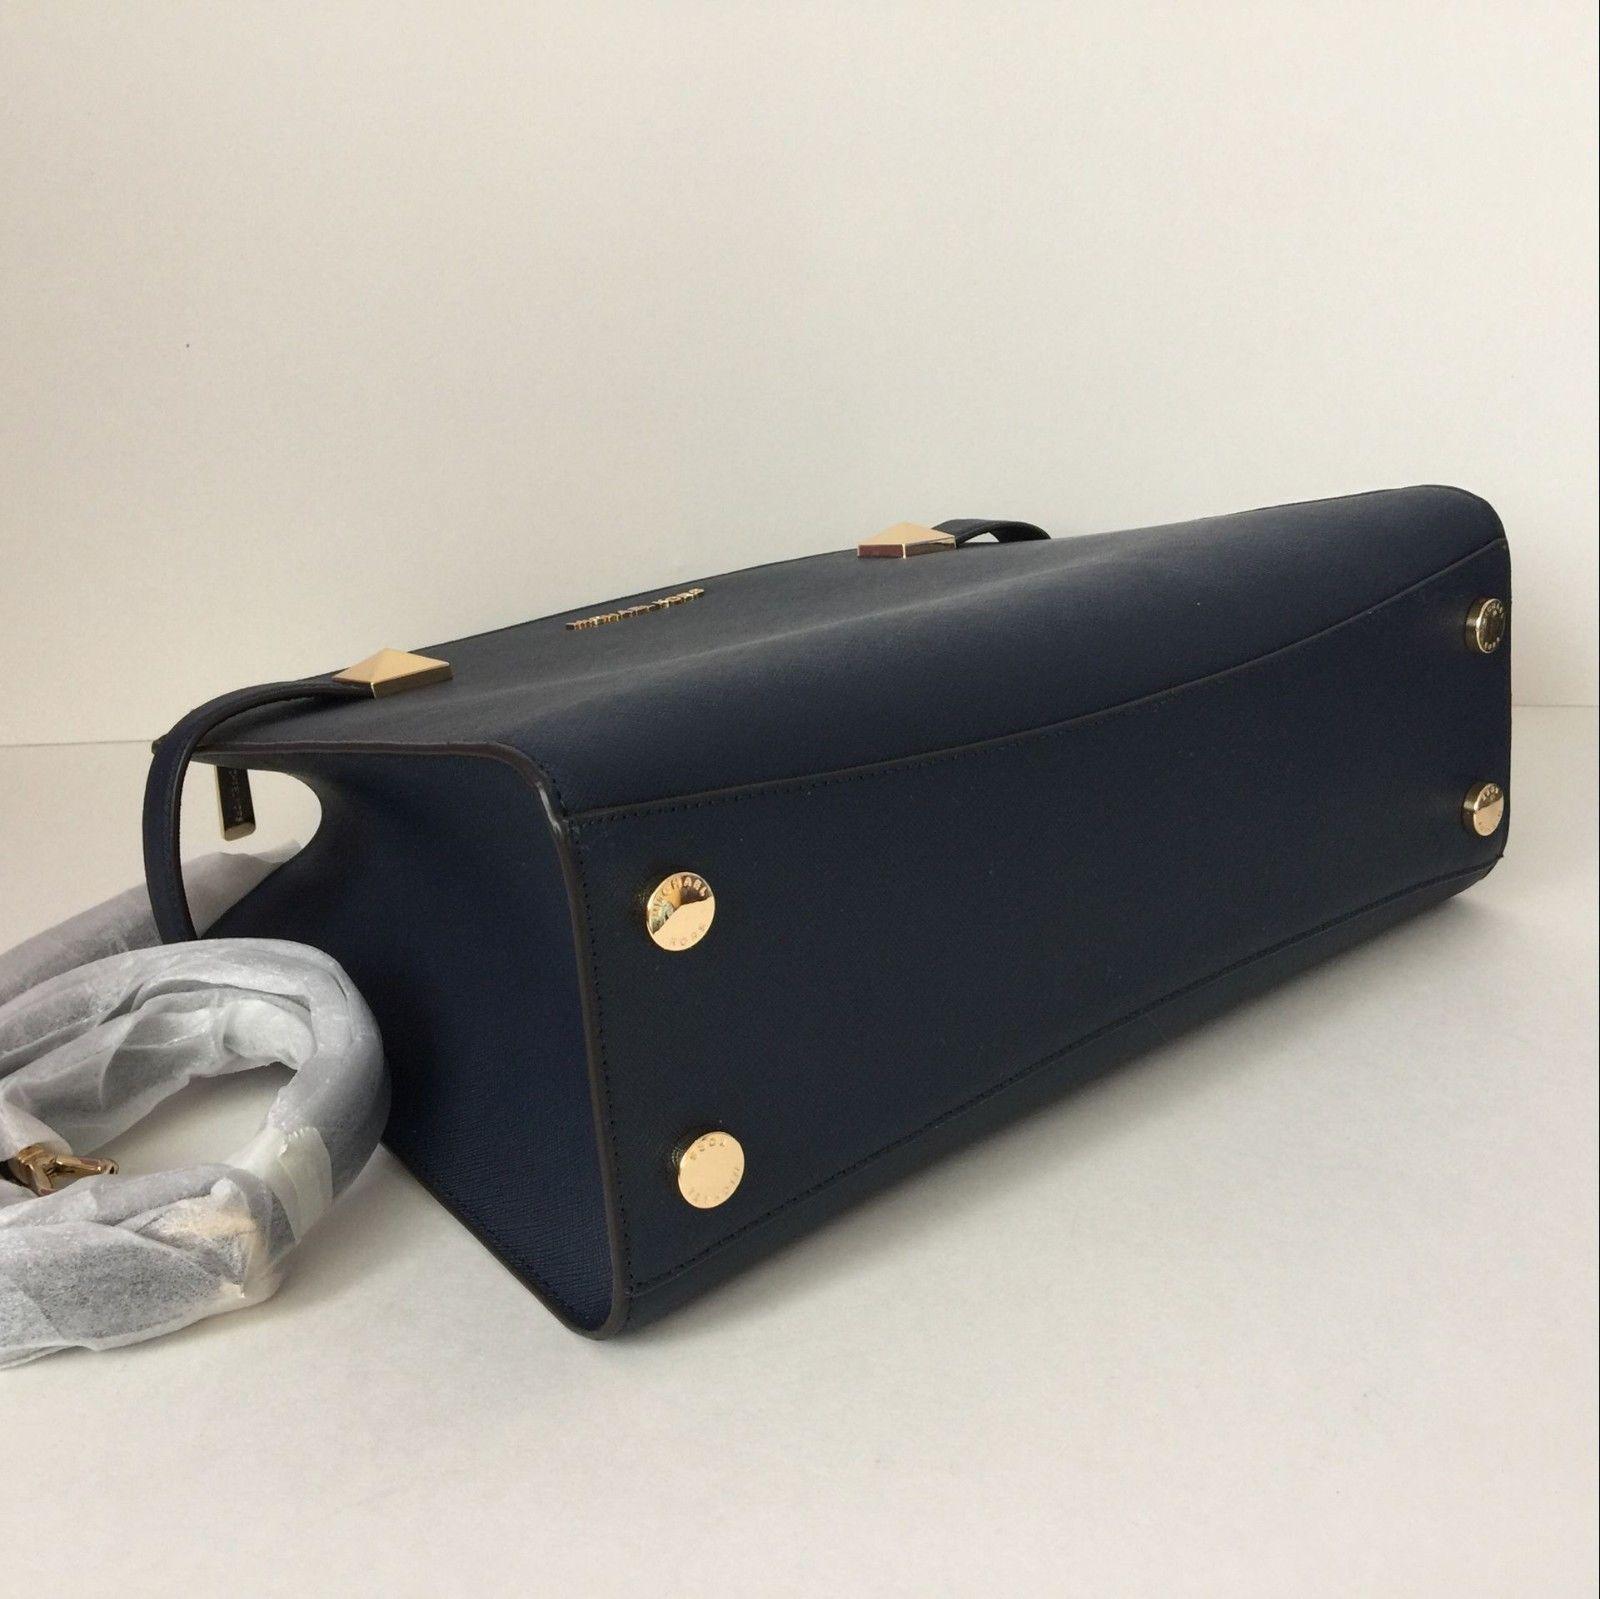 e43ab5c26f54 NWT Michael Kors Karla Medium Satchel Handbag Navy Saffiano Leather $378